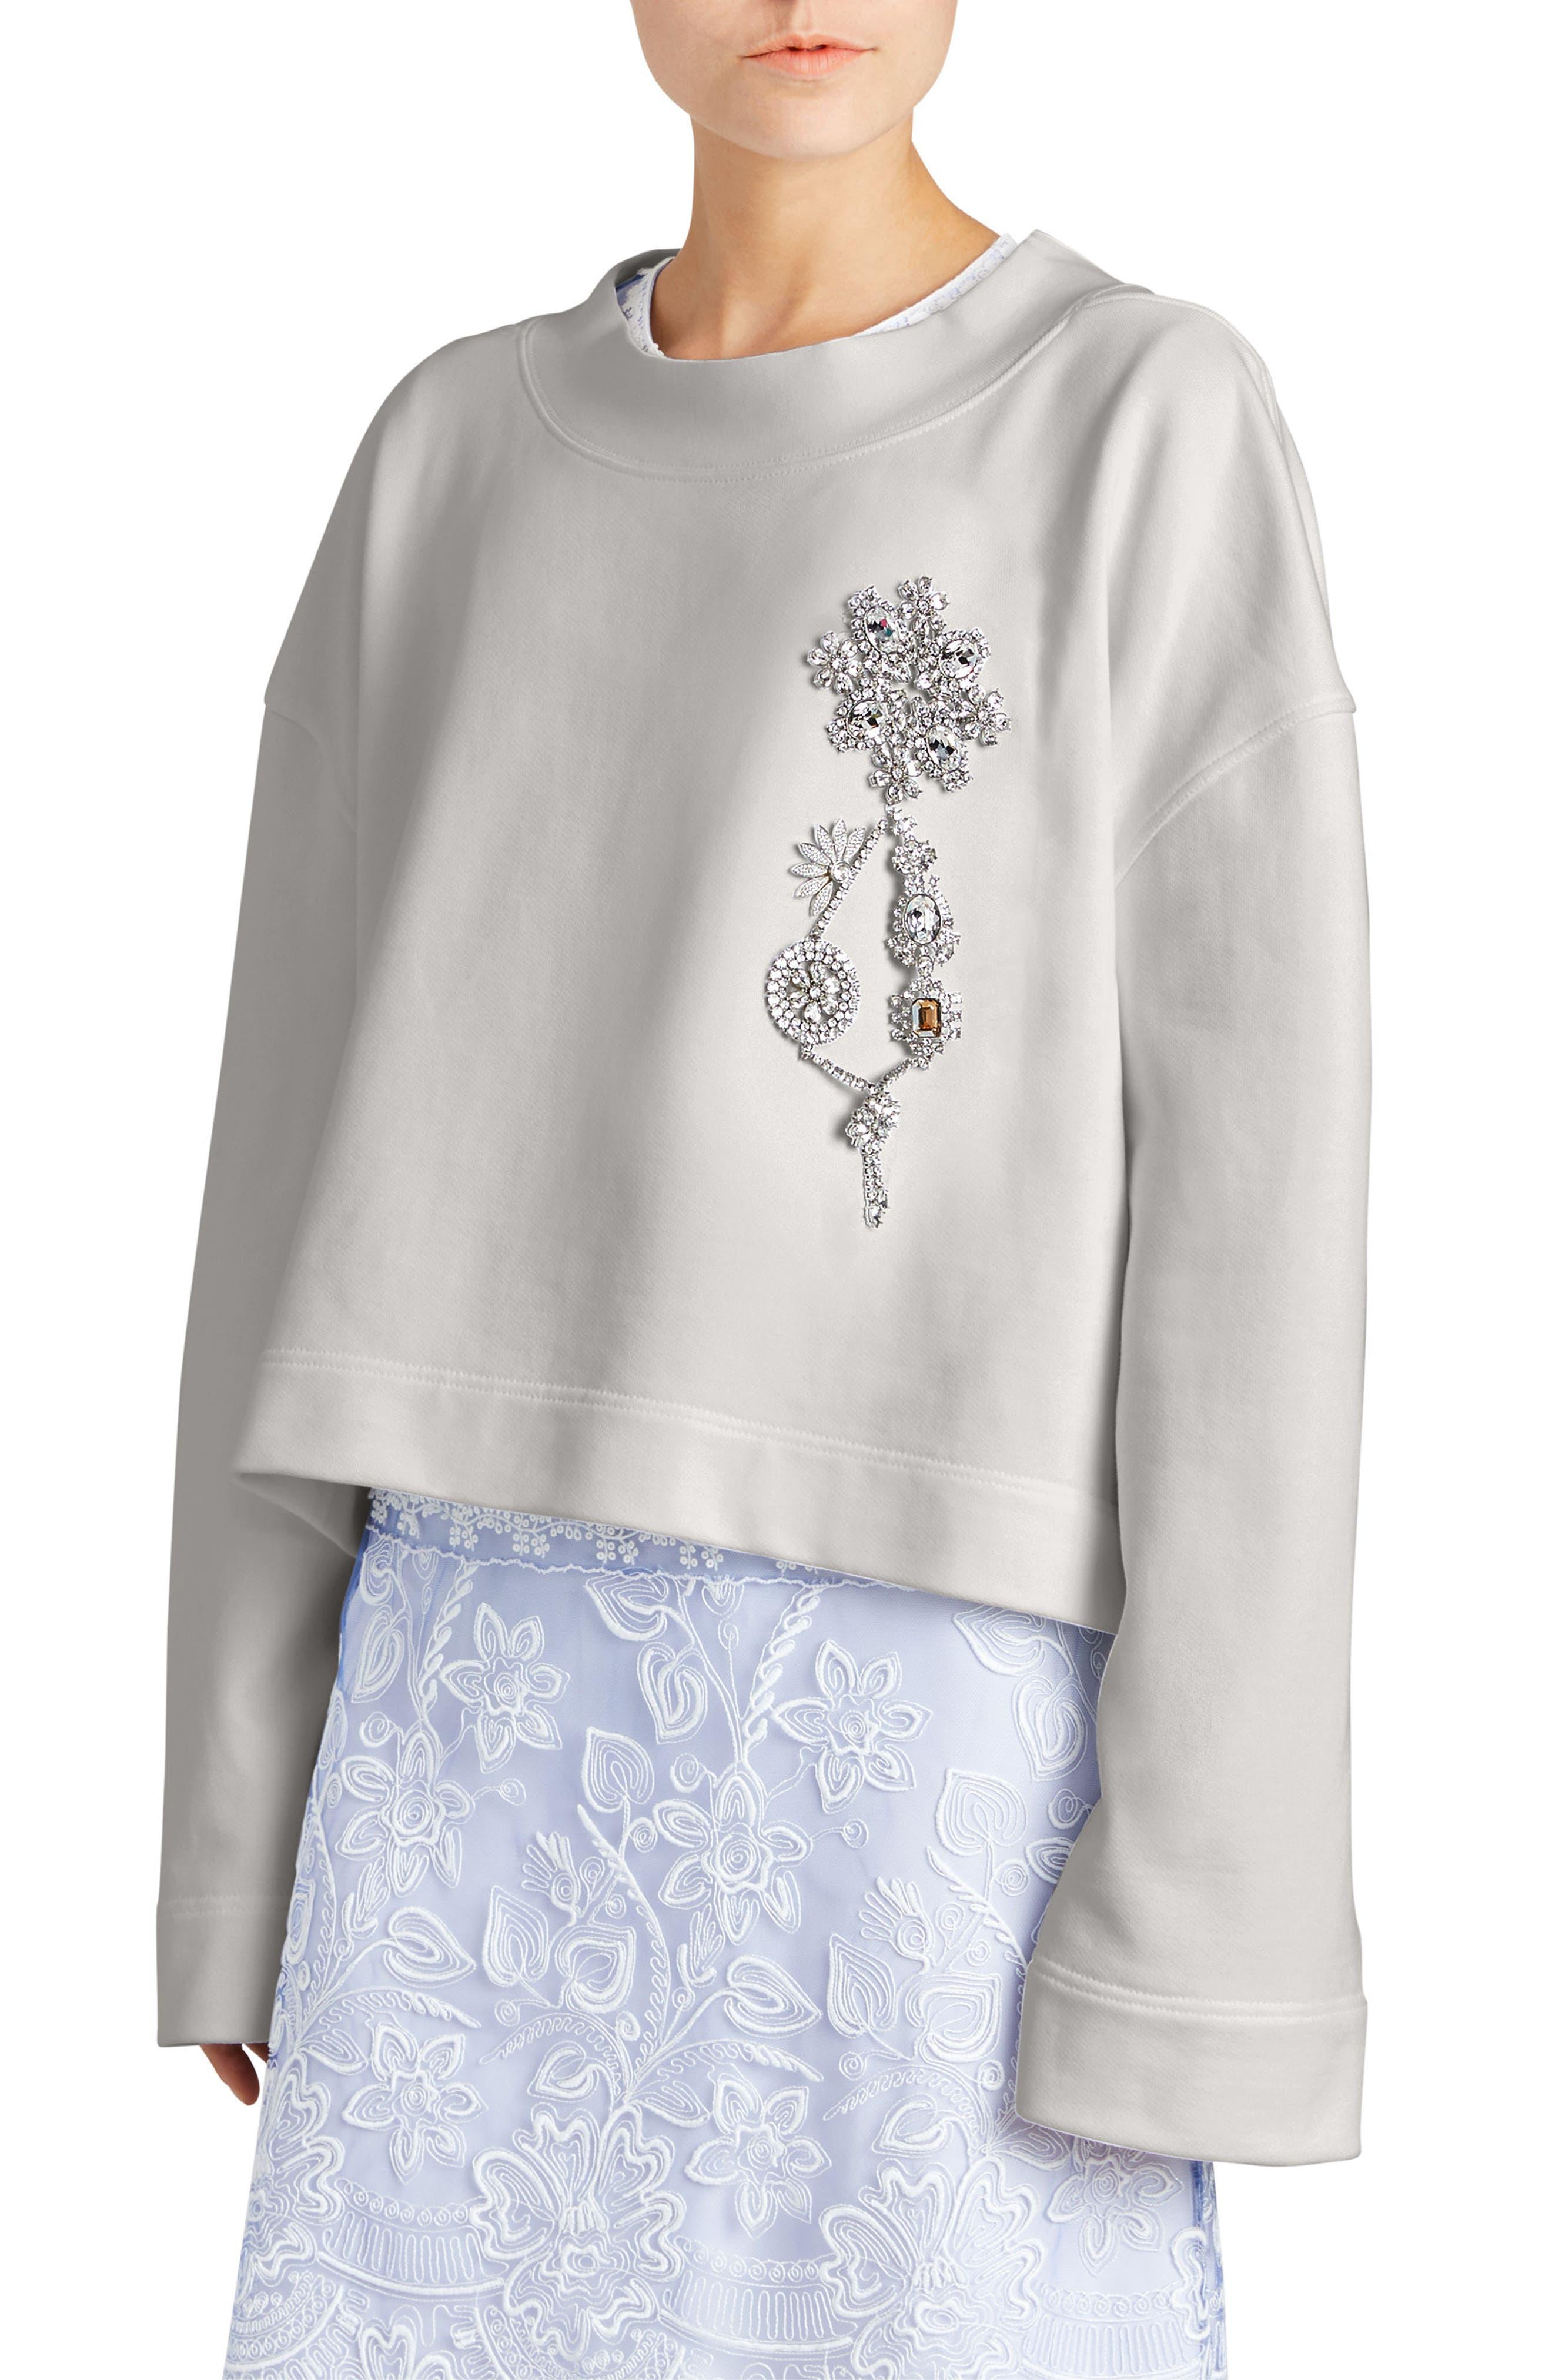 Burberry Brooch Detail Cotton Sweatshirt